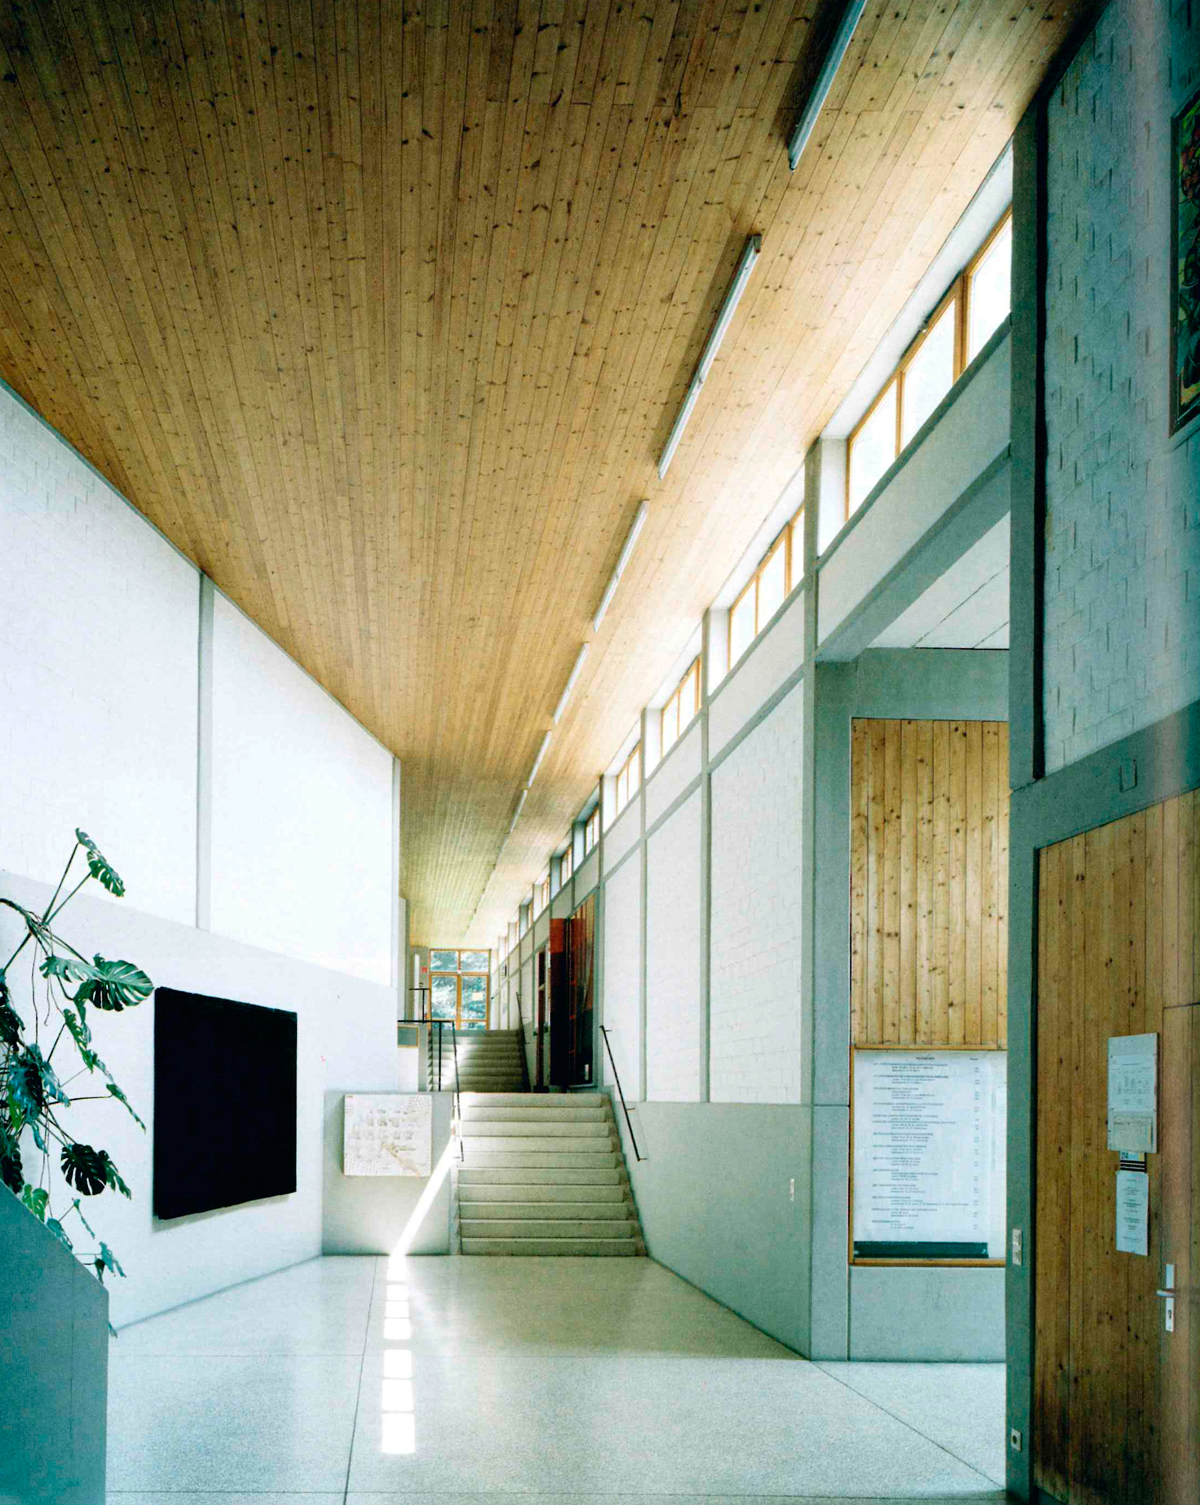 max bill hochschule f r gestaltung ulm hic arquitectura. Black Bedroom Furniture Sets. Home Design Ideas